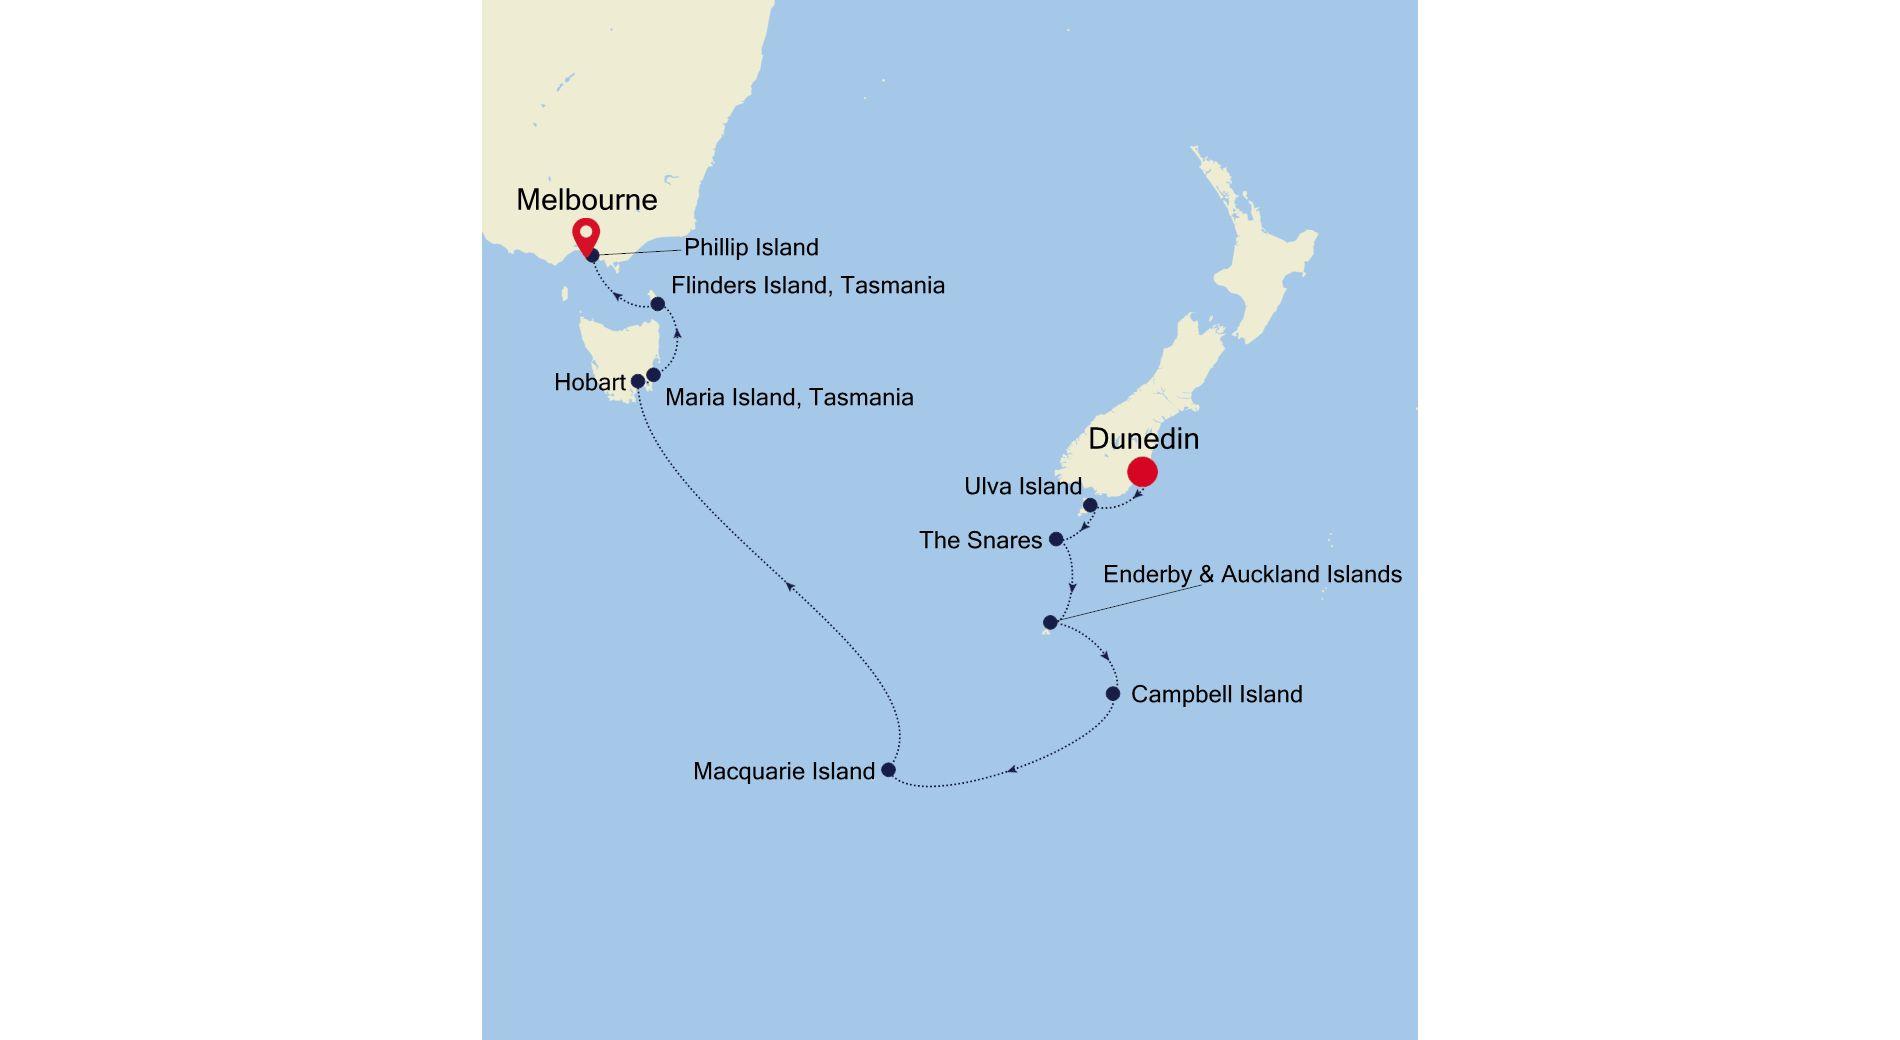 E1210209015 - Dunedin nach Melbourne